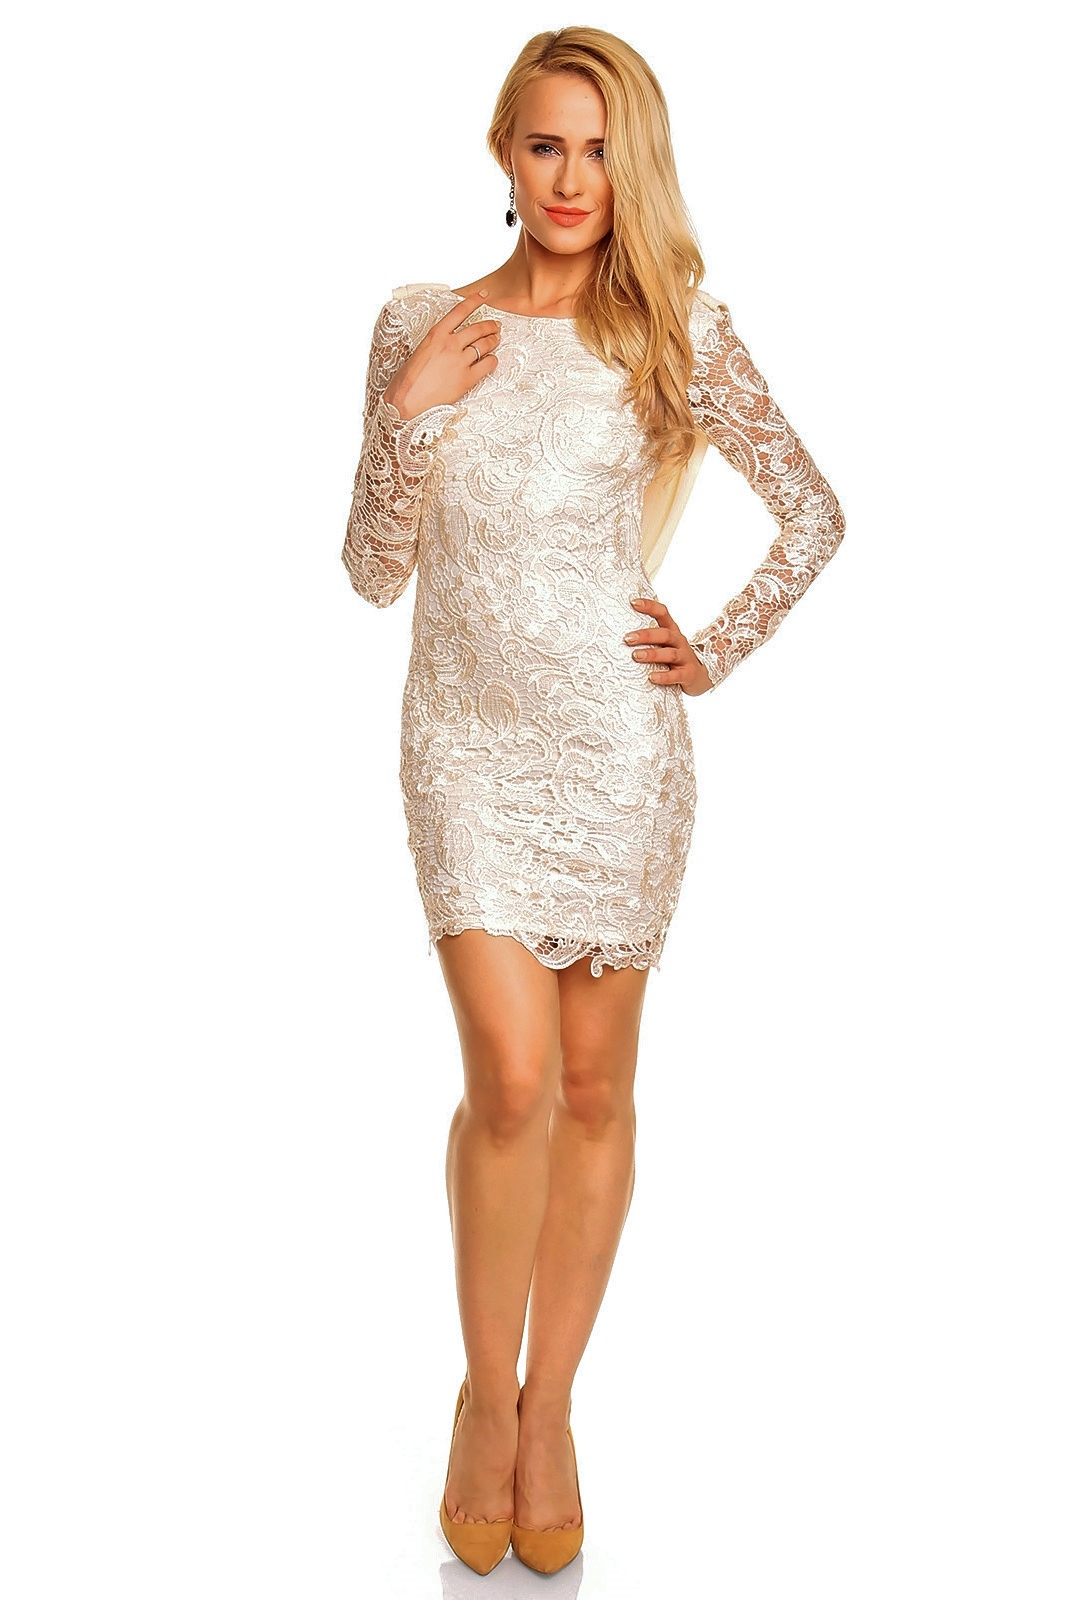 Mayaadi Kleid Minikleid Chiffon Häkel Spitze Abendkleid Spitzenkleid ...